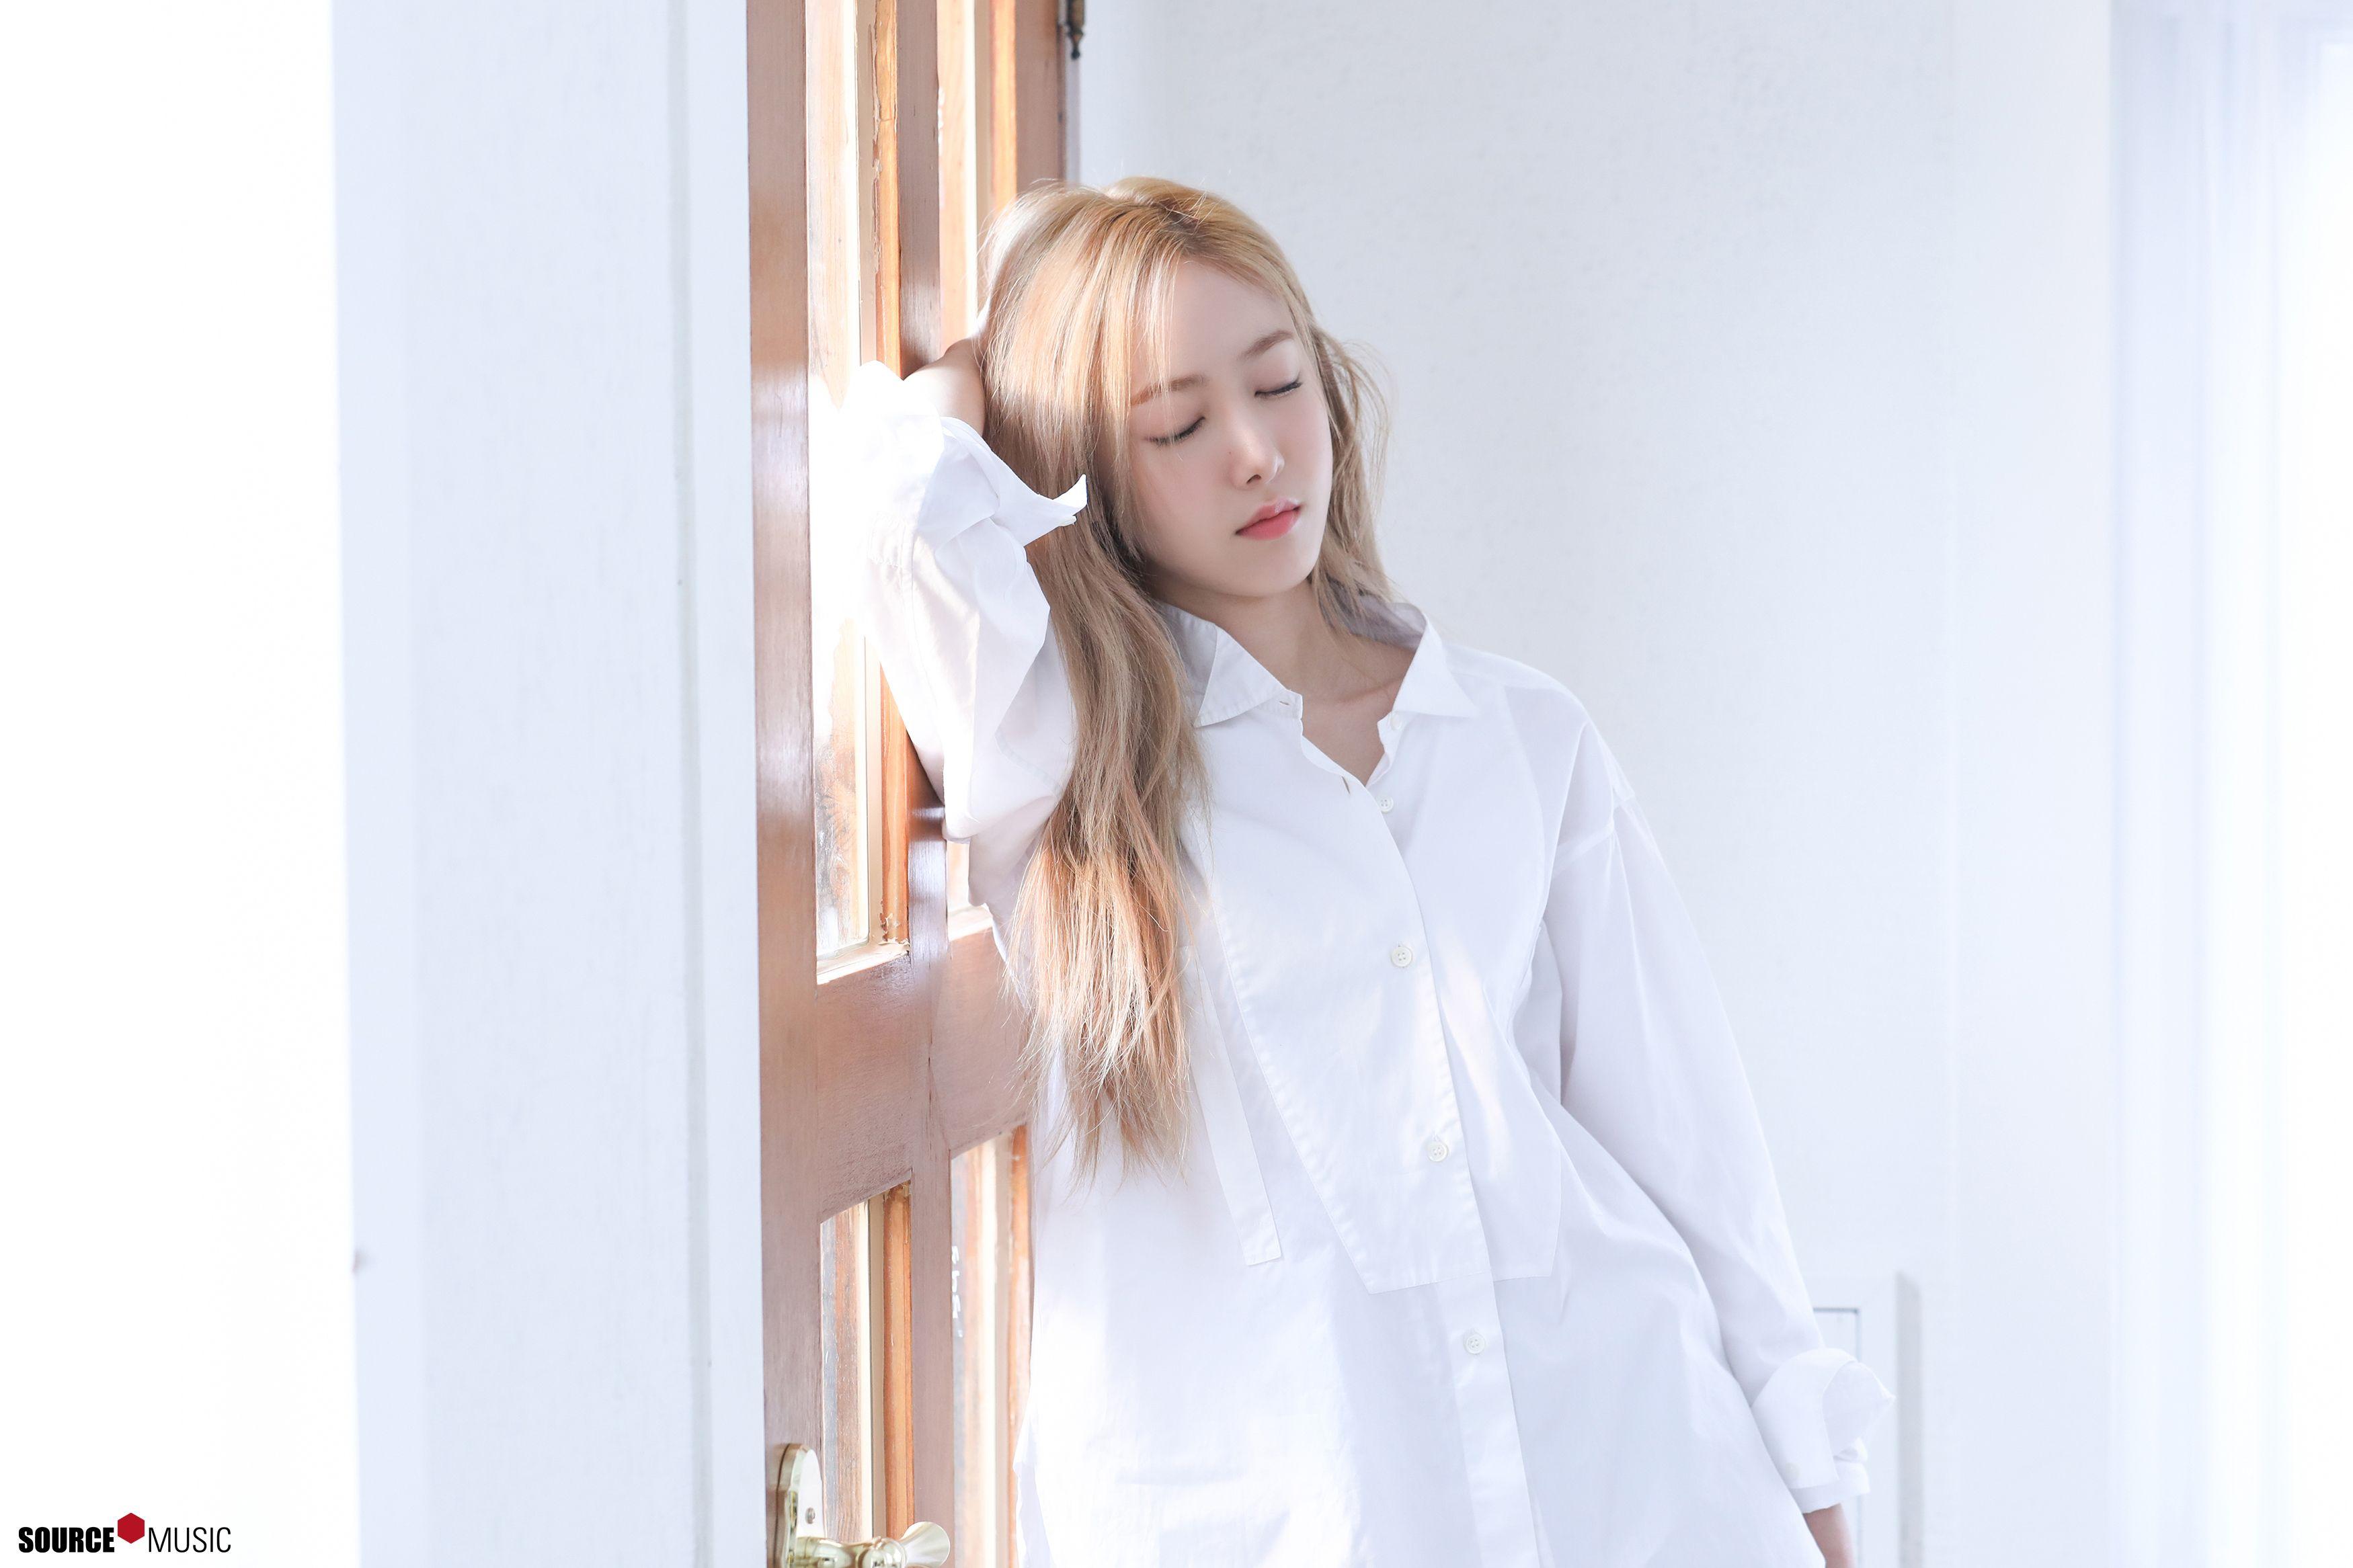 SinB Gfriend K Pop Singer Korean Women 3500x2333